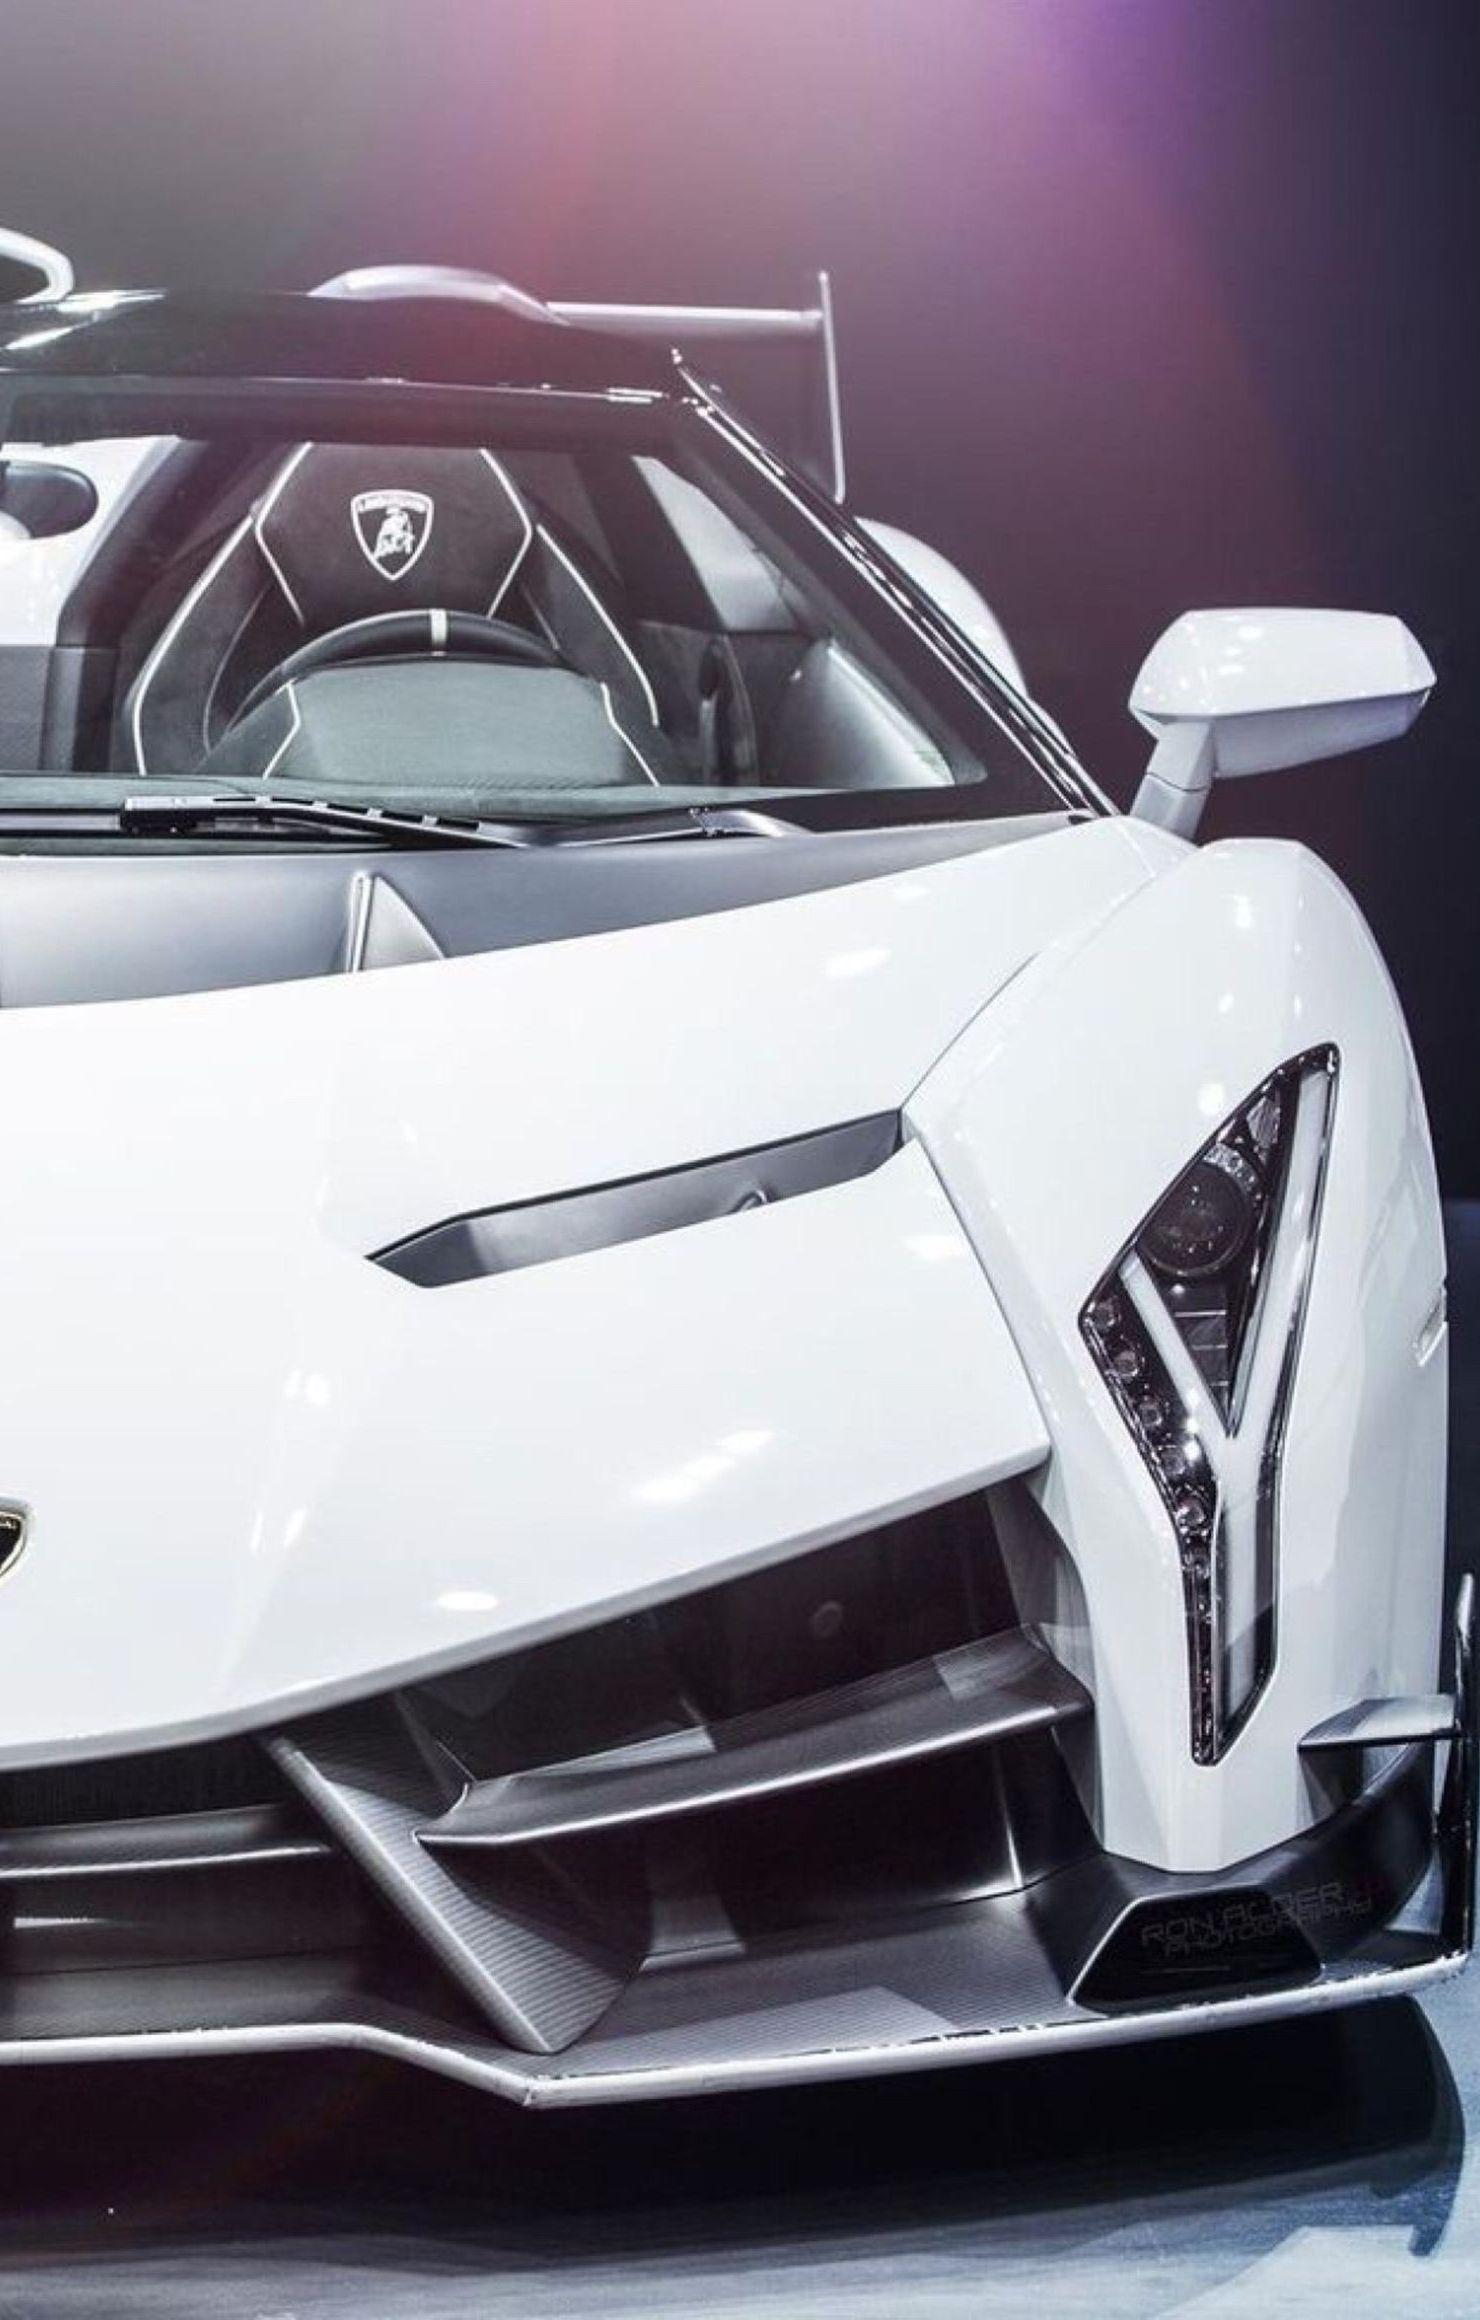 Lamborghini Veneno Hd Mobile Wallpapers Wallpaper Cave